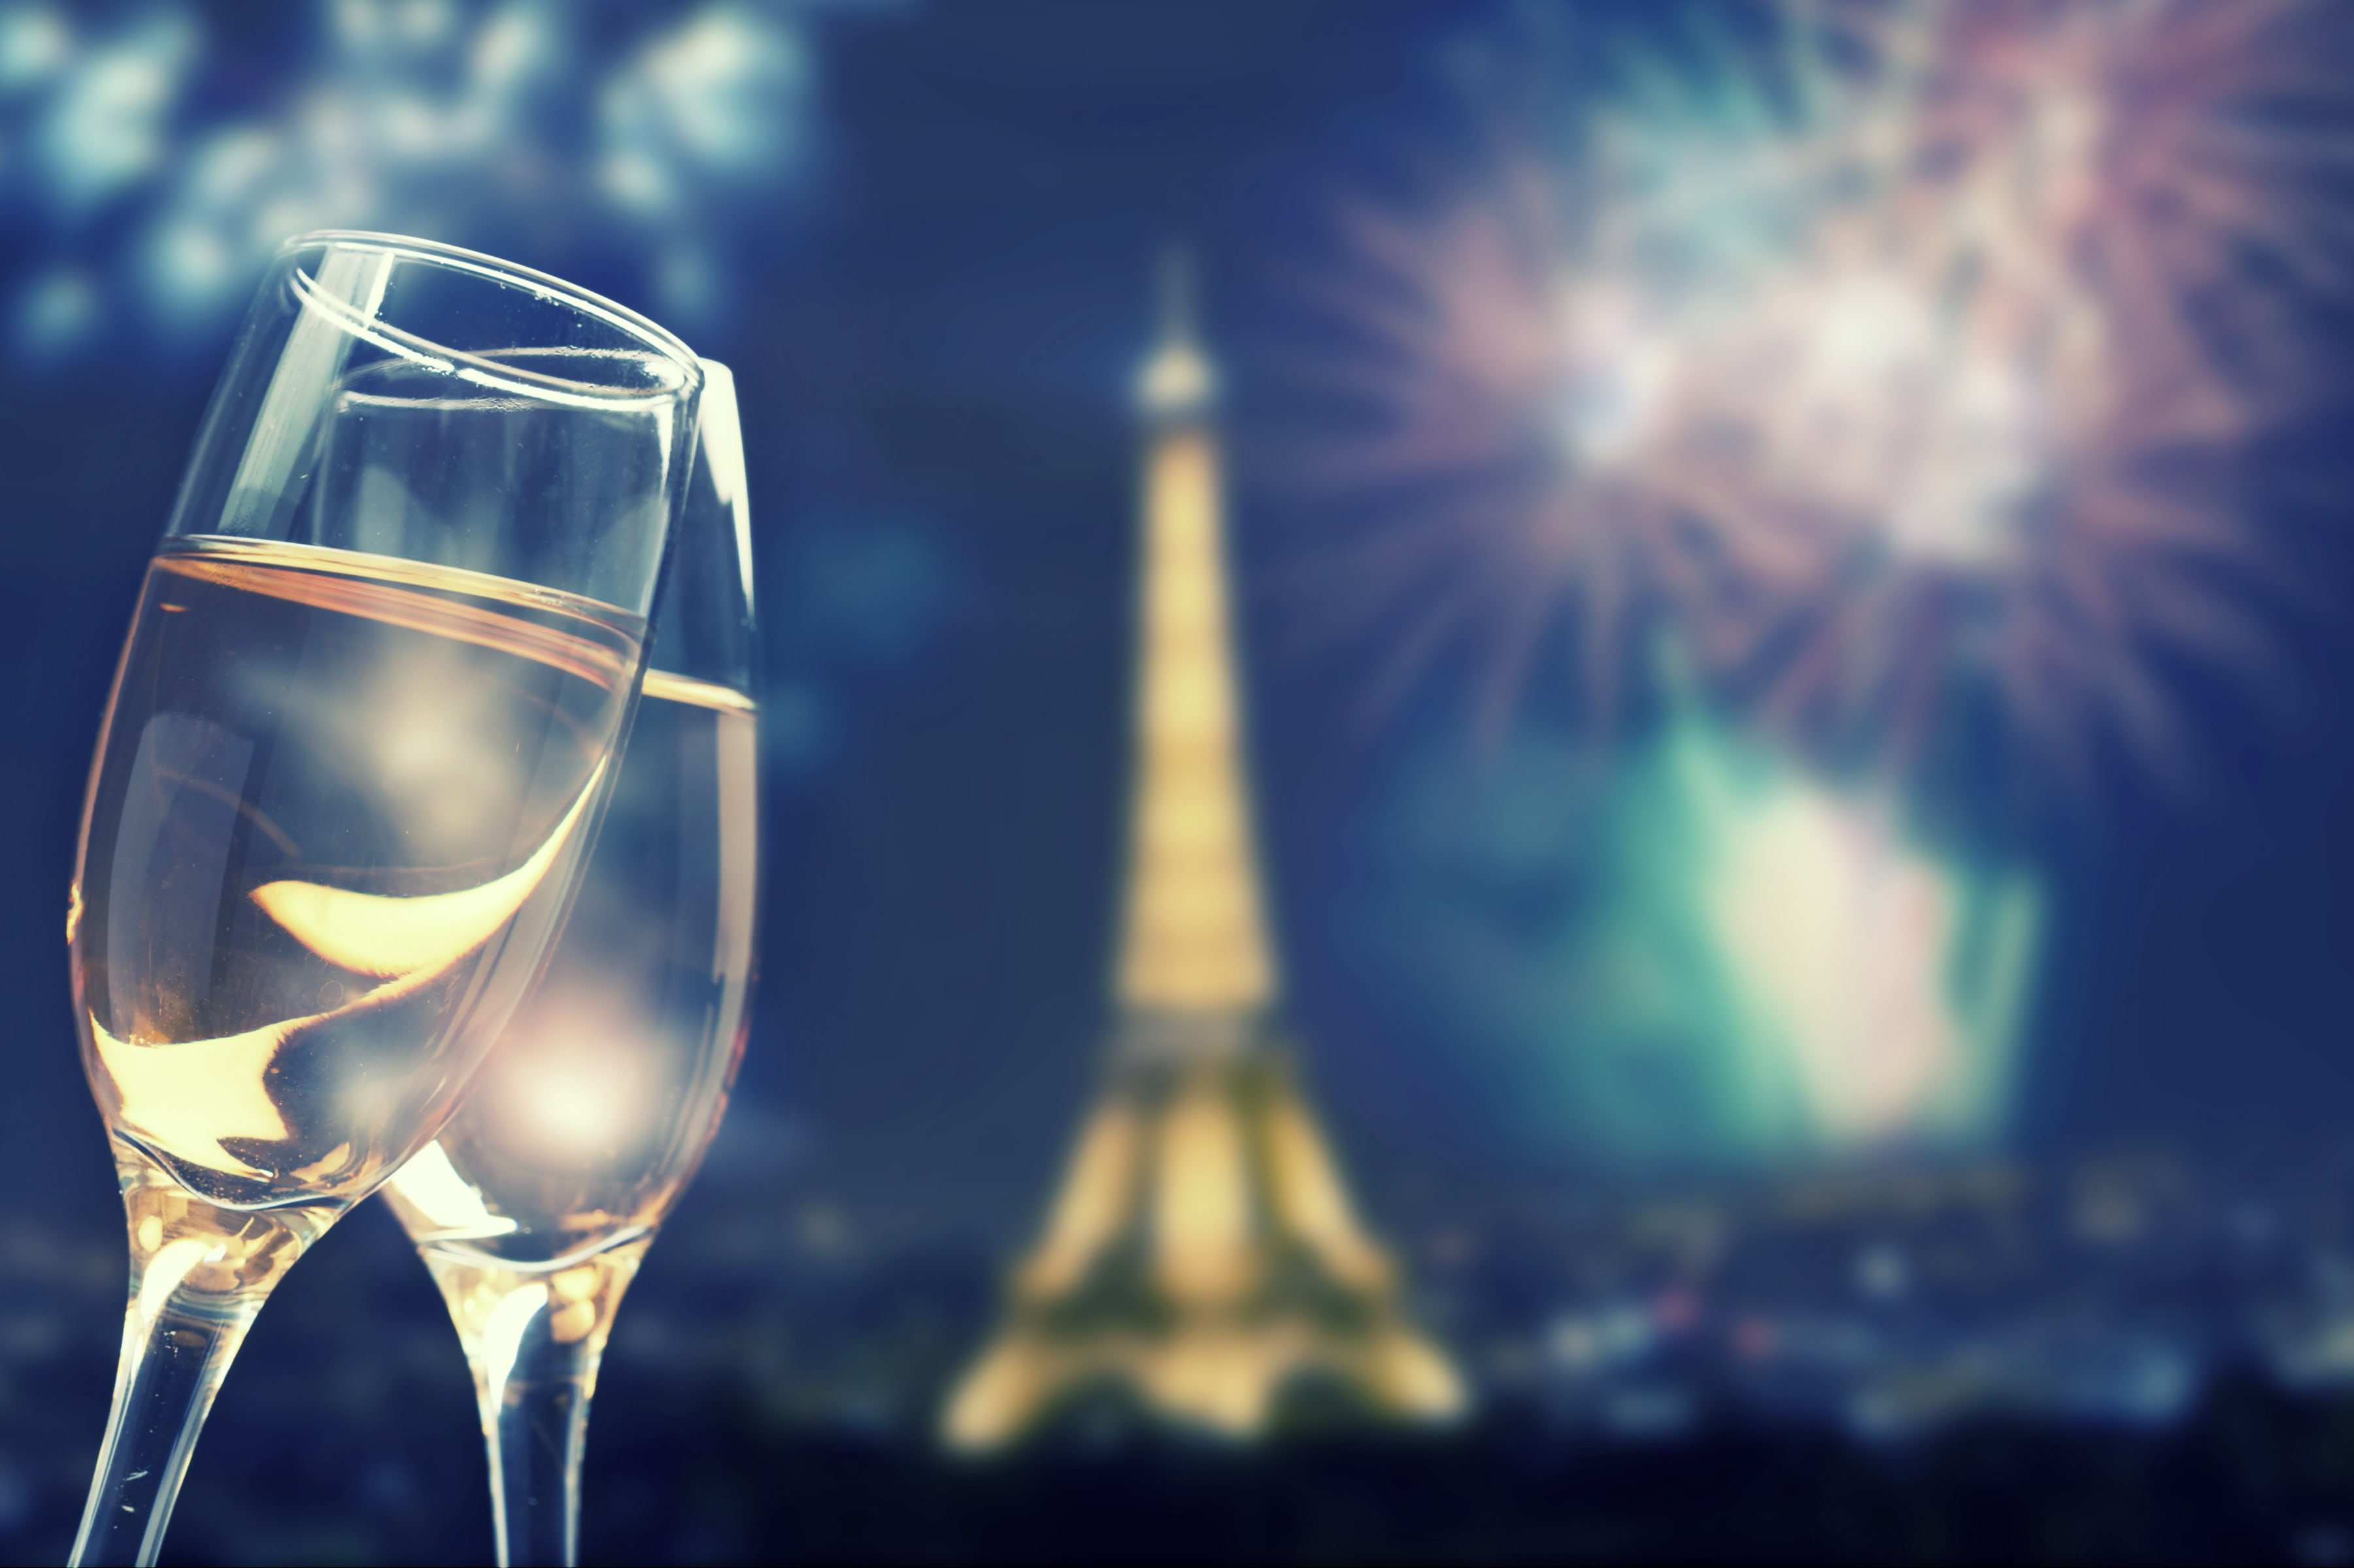 Coupes Champagne Tour Eiffel